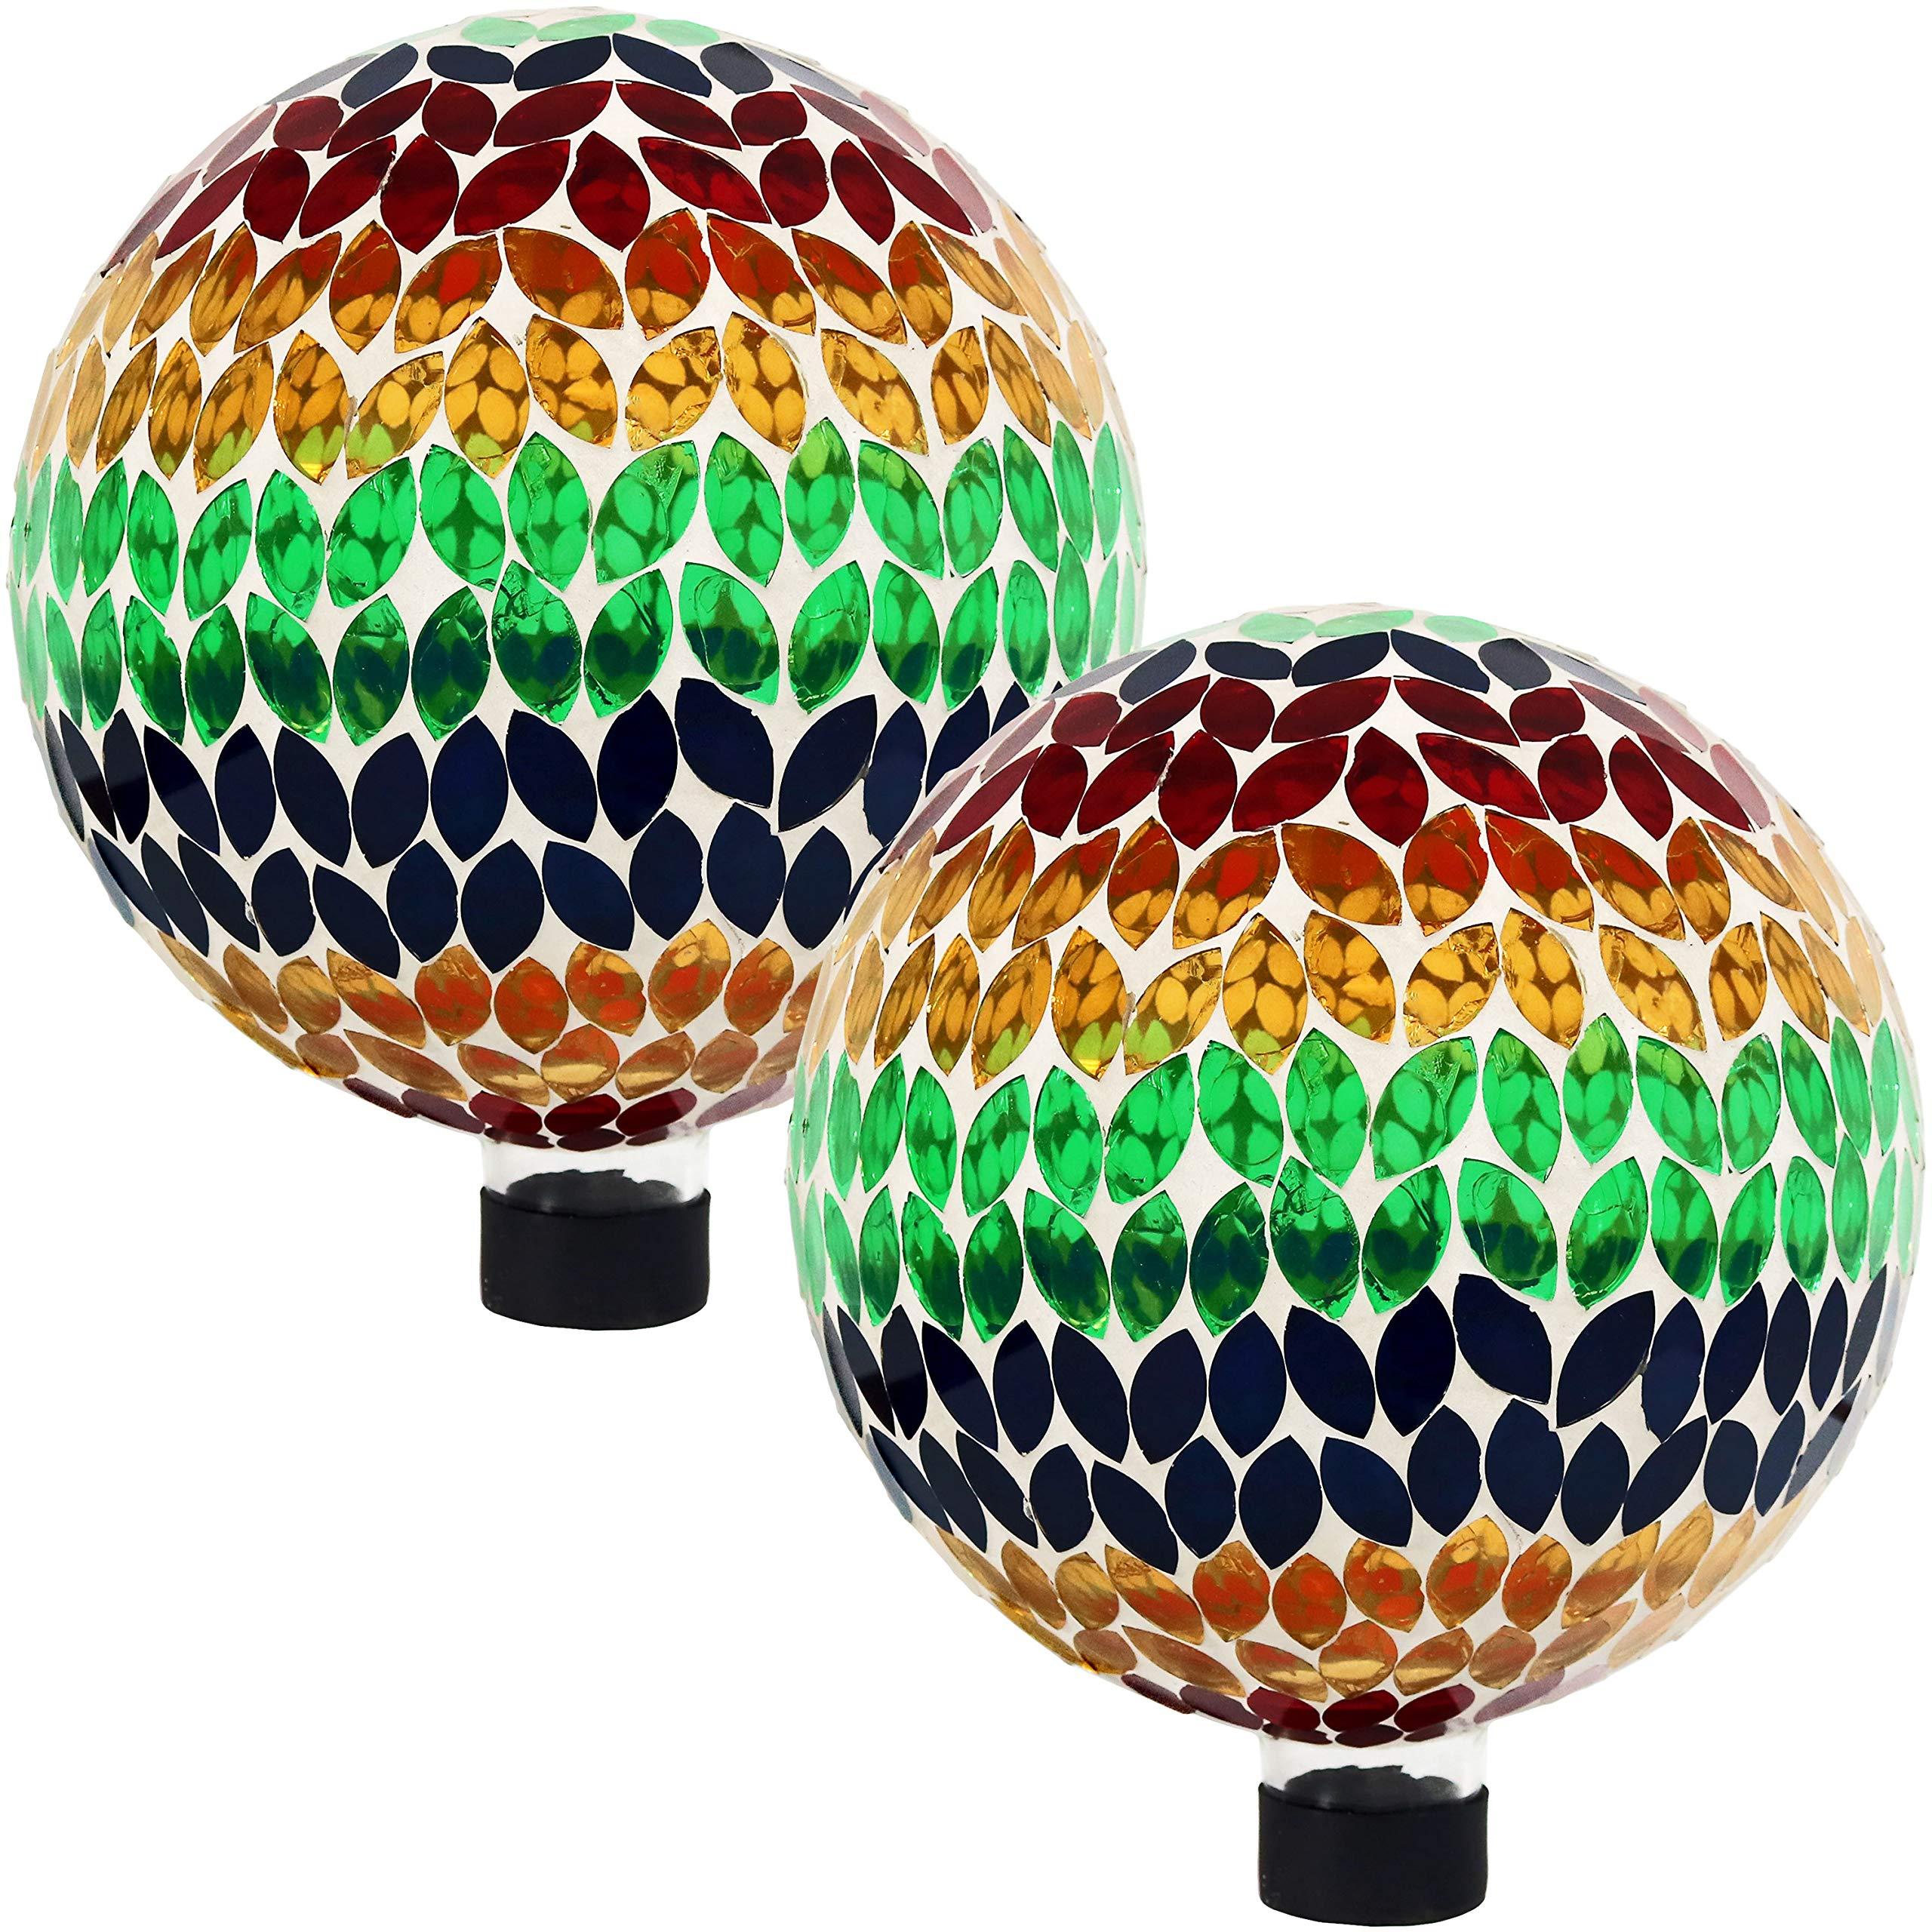 Sunnydaze Mosaic Gazing Globe Glass Garden Ball, Outdoor Lawn and Yard Ornament, Multi, 10 Inch, Set of 2